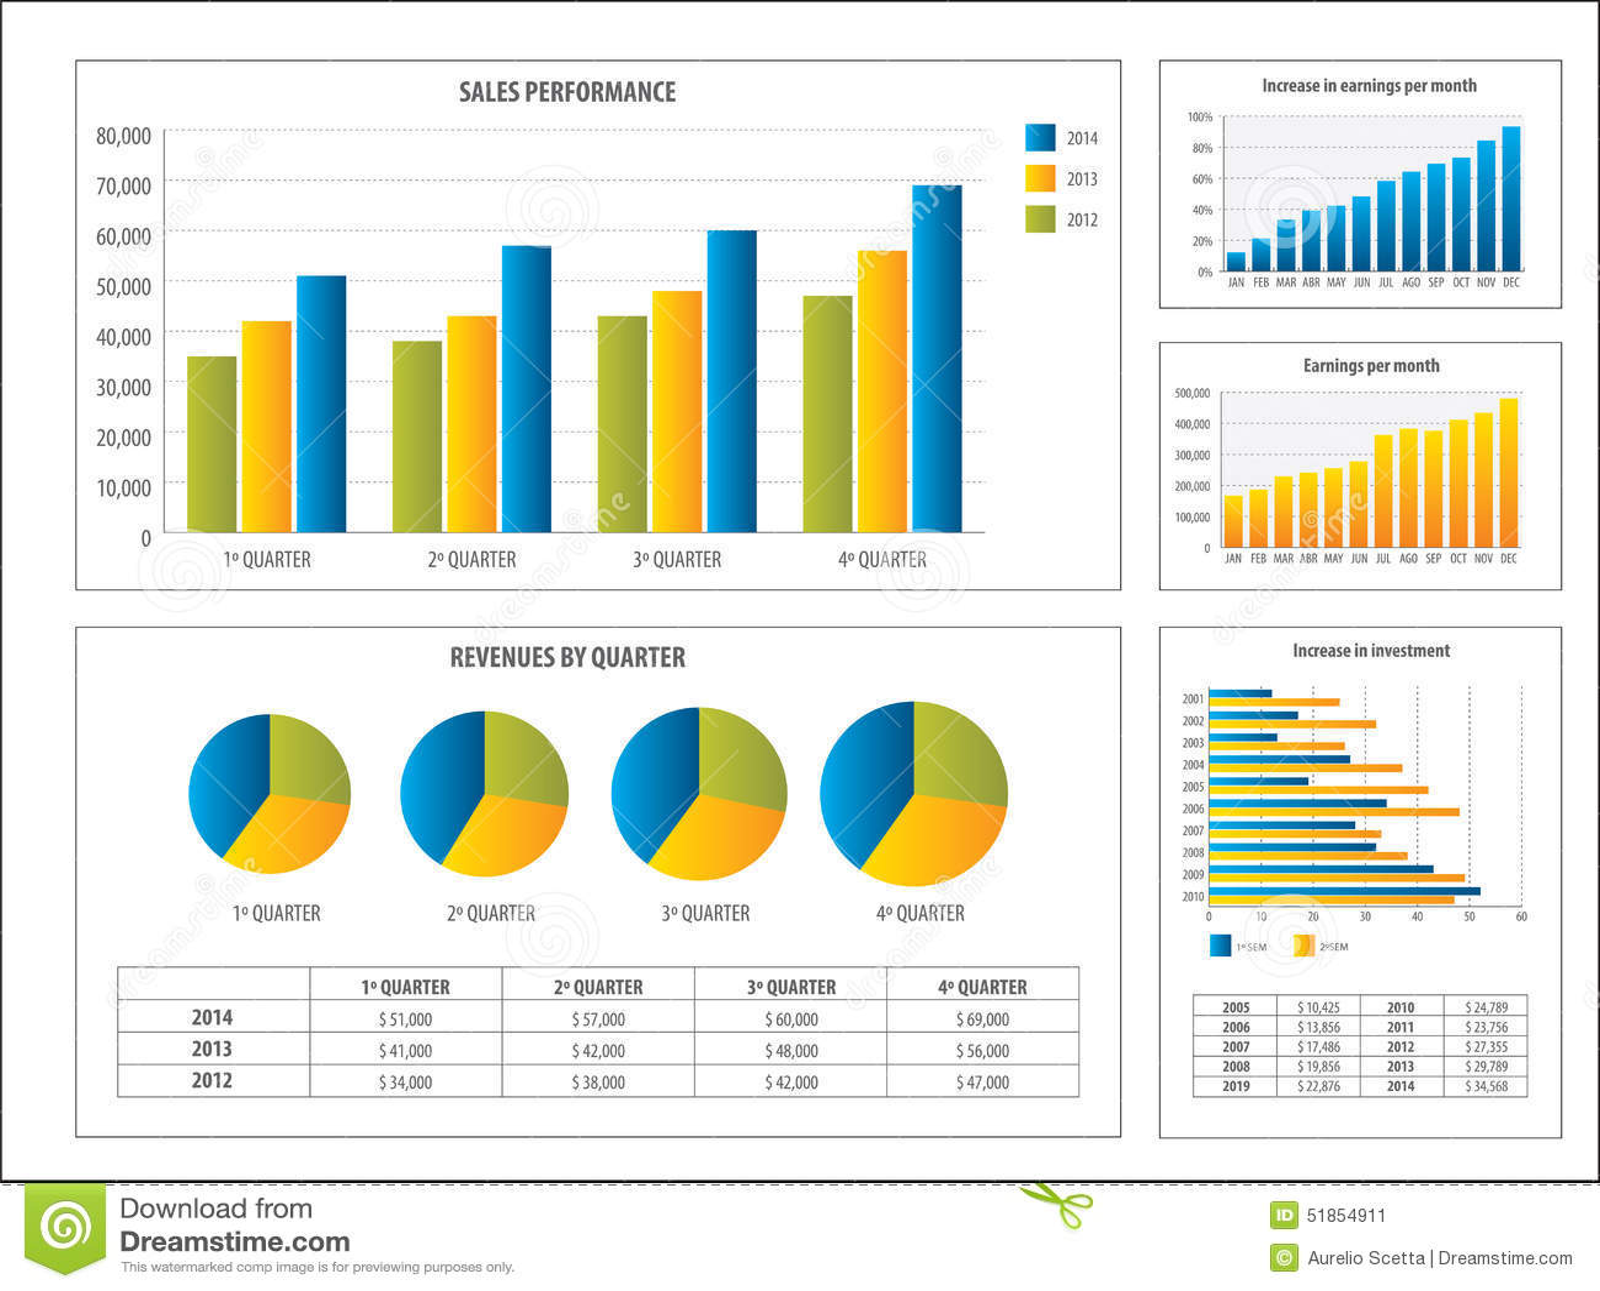 Creating RRG Charts